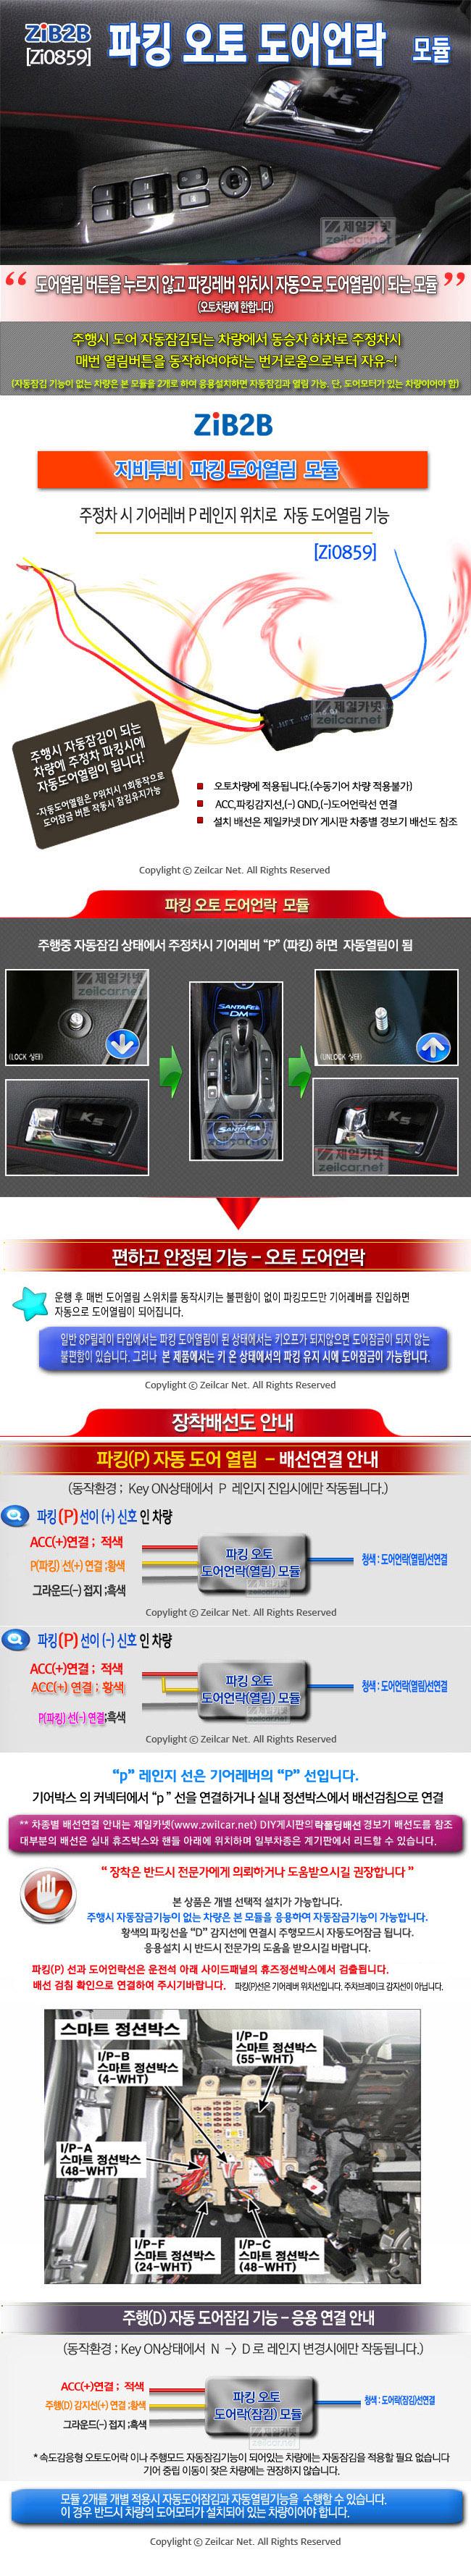 [ZiB2B] 파킹 도어열림 릴레이 / 파킹(P) 도어언락 모듈 / 주차(P)시 자동 도어열림 모듈 [Zi0859]